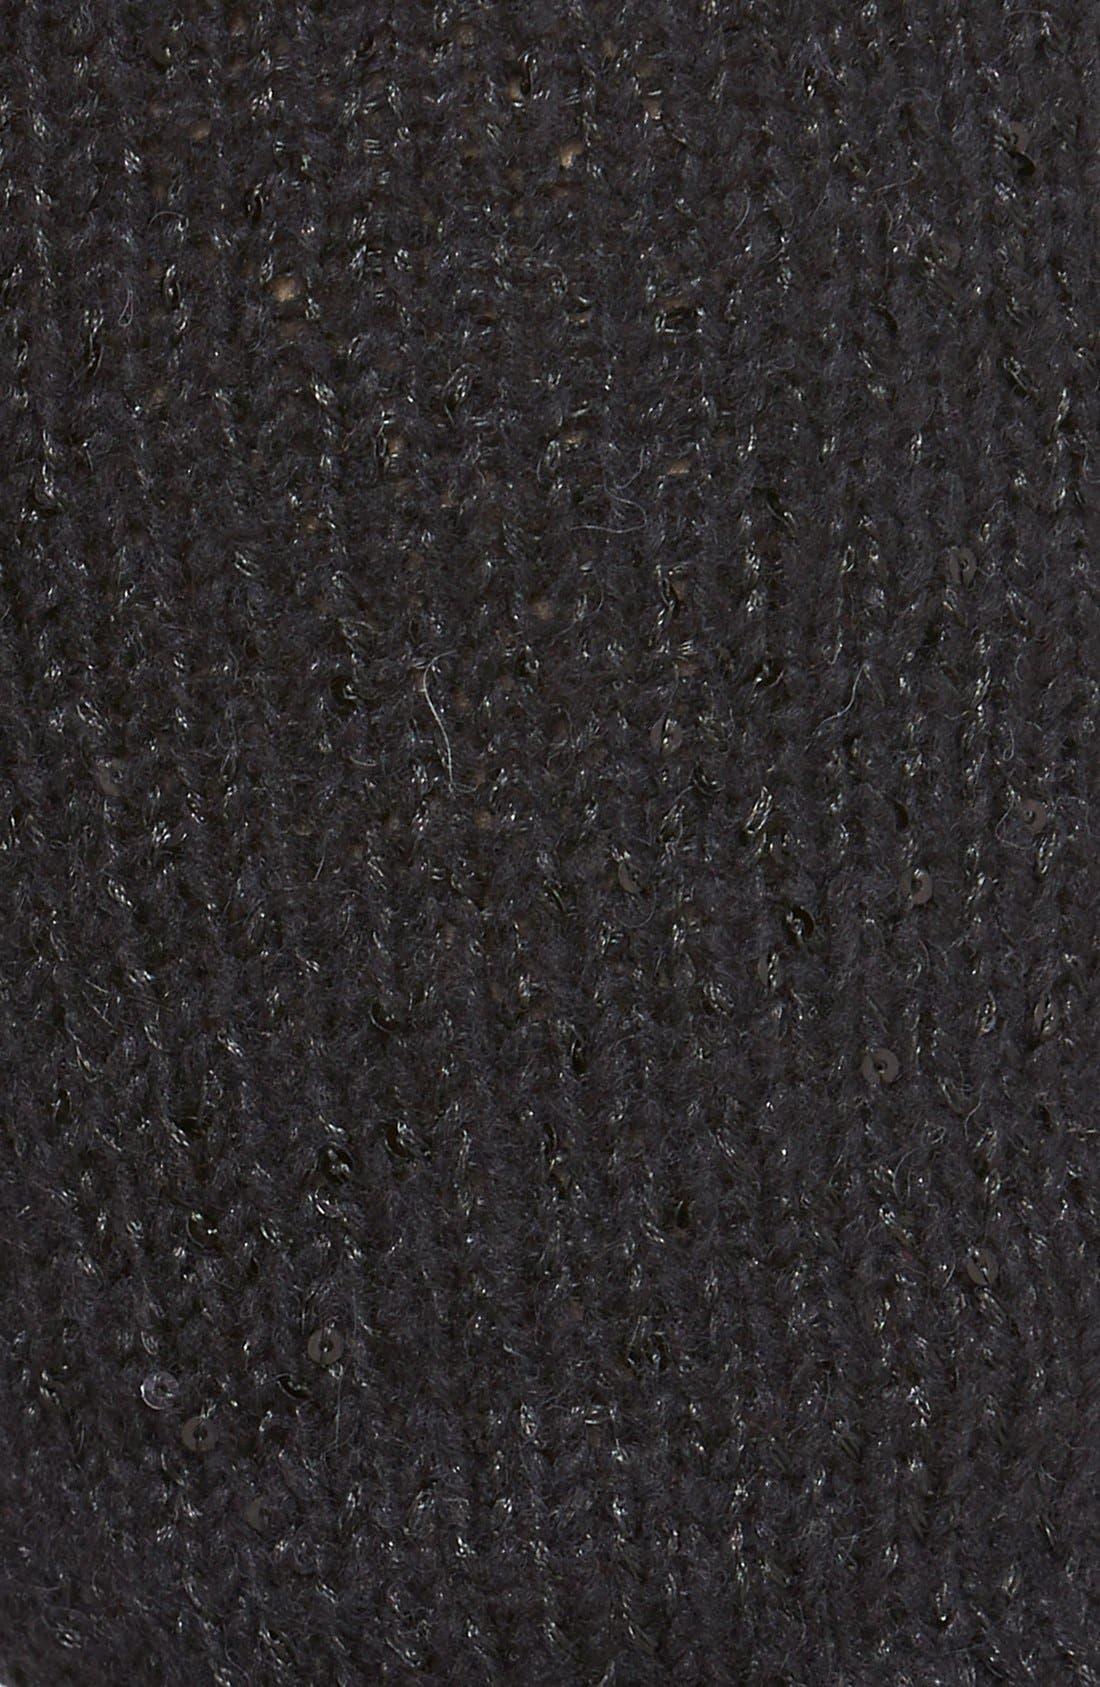 Alternate Image 2  - DKNY Sequin Leg Warmers